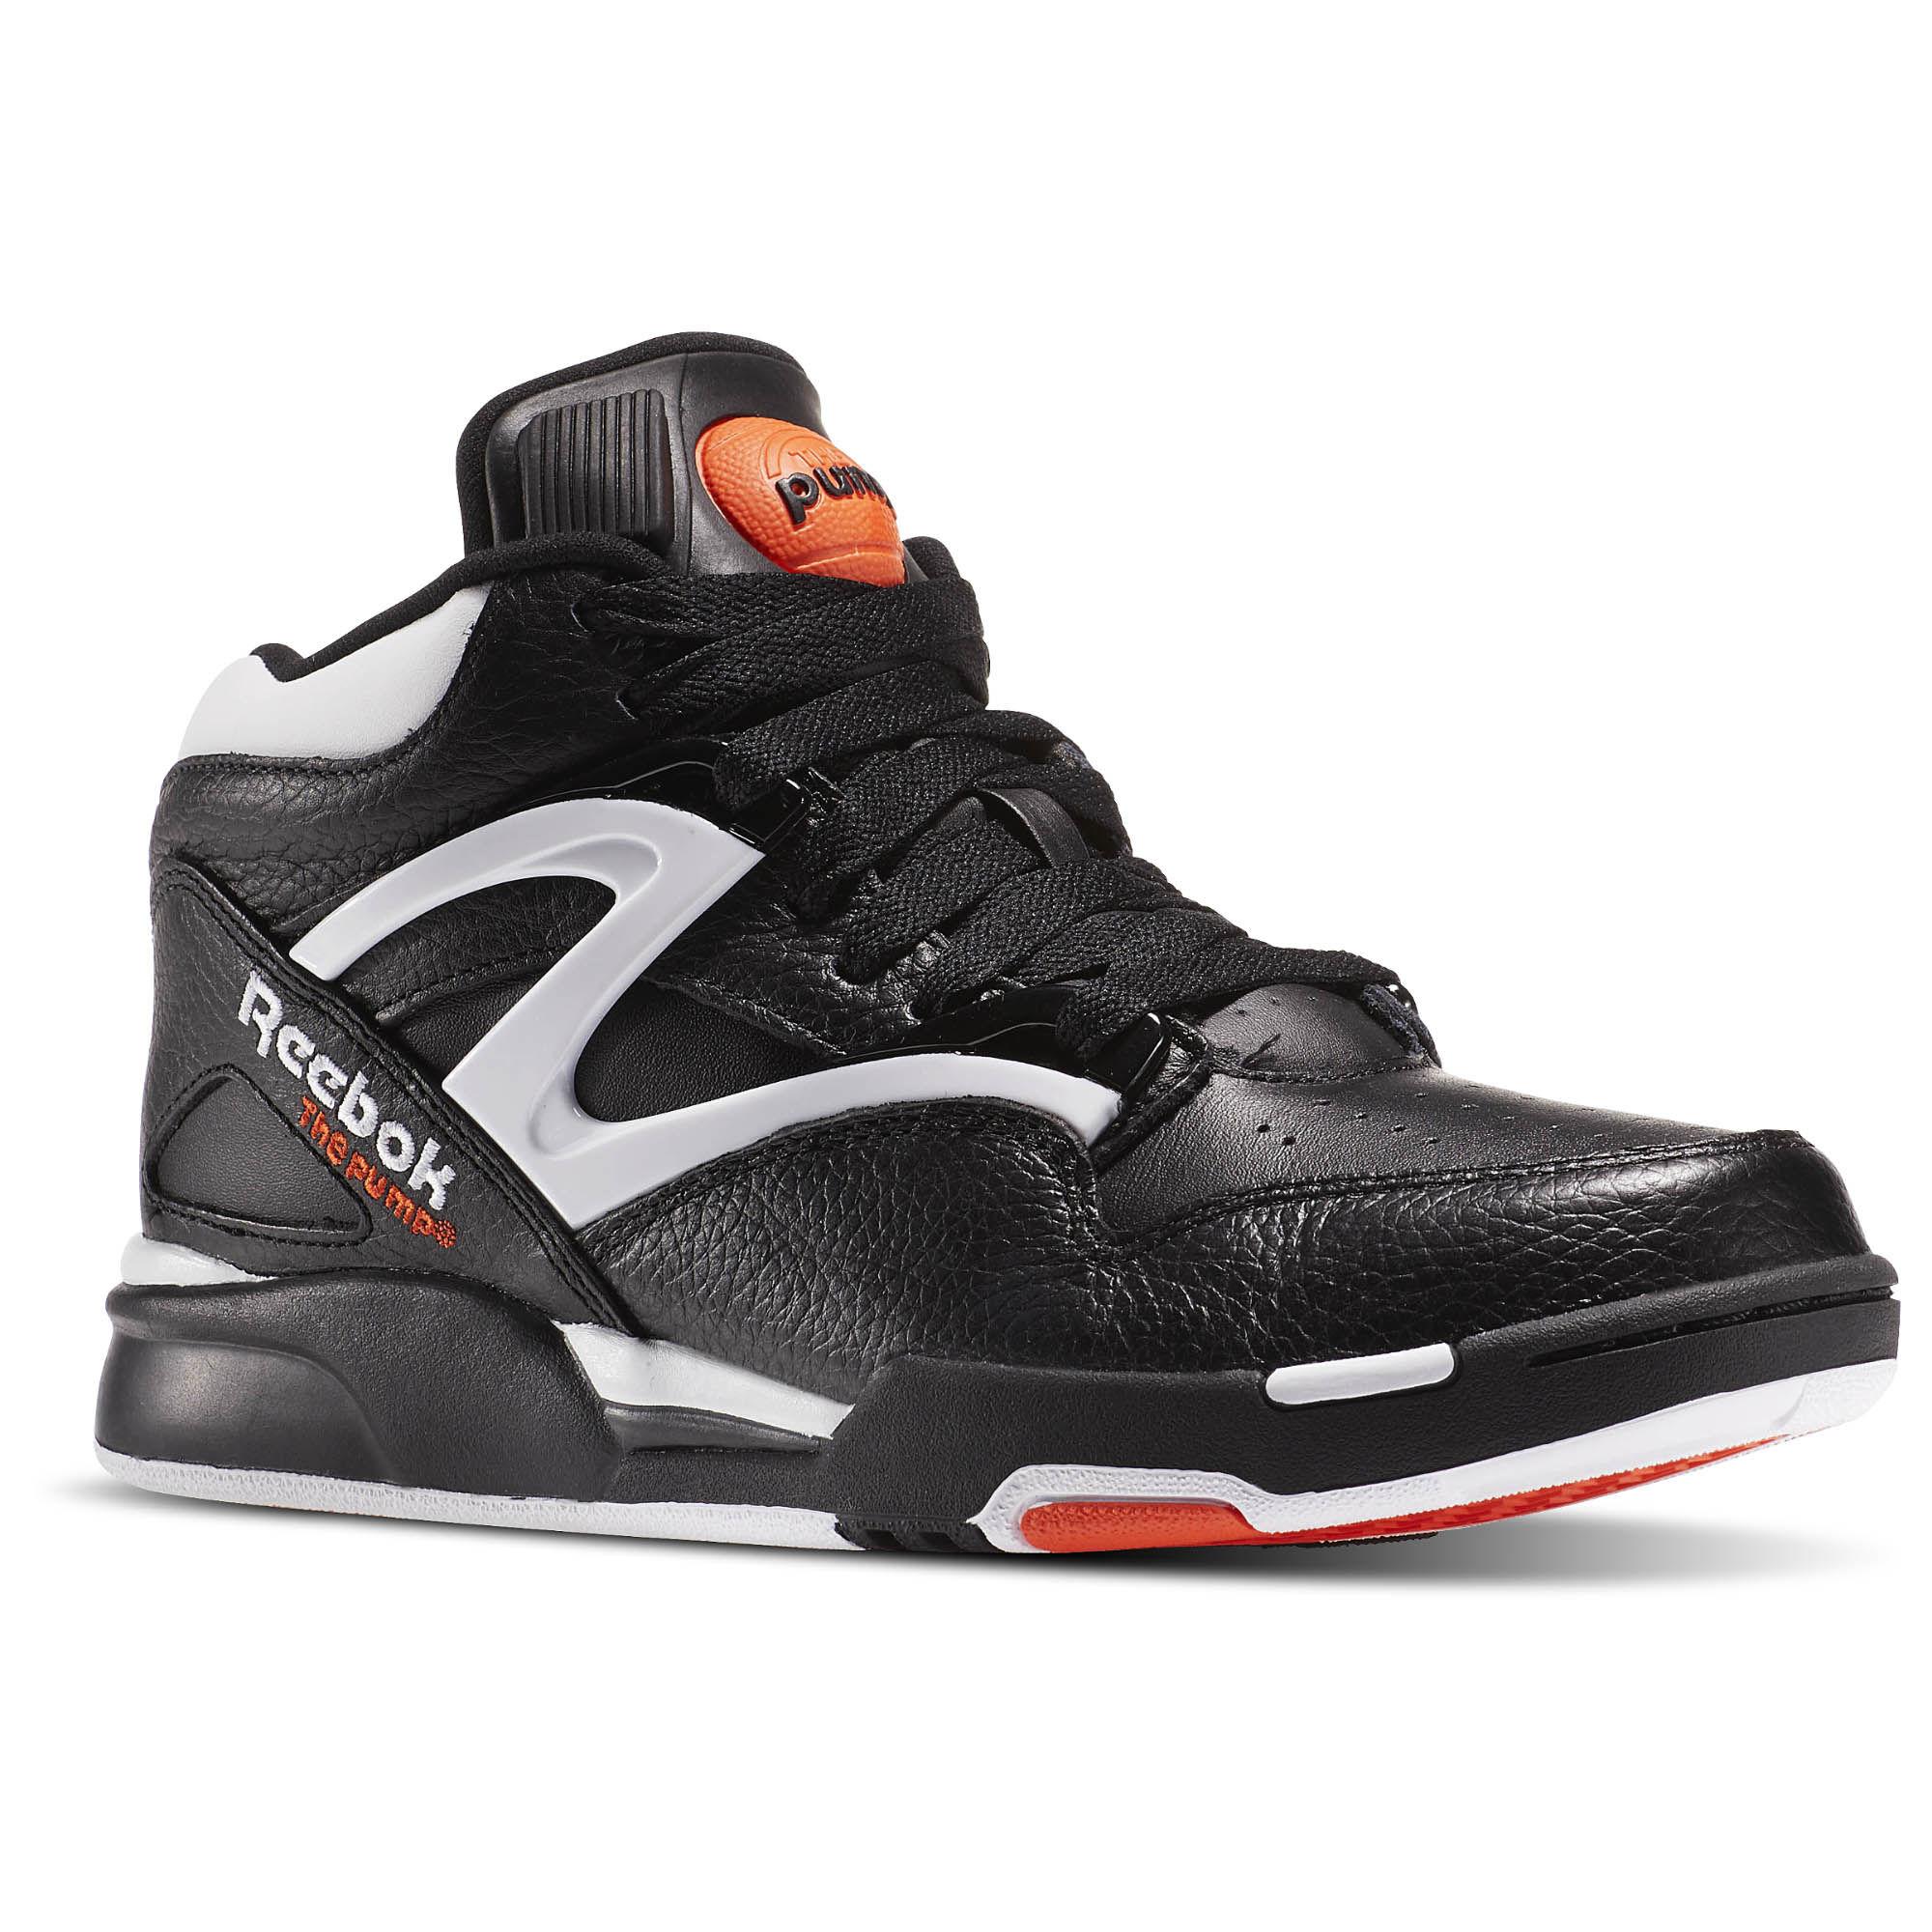 f78c8bf9c4a Reebok pump – A Great Sneaker! – fashionarrow.com